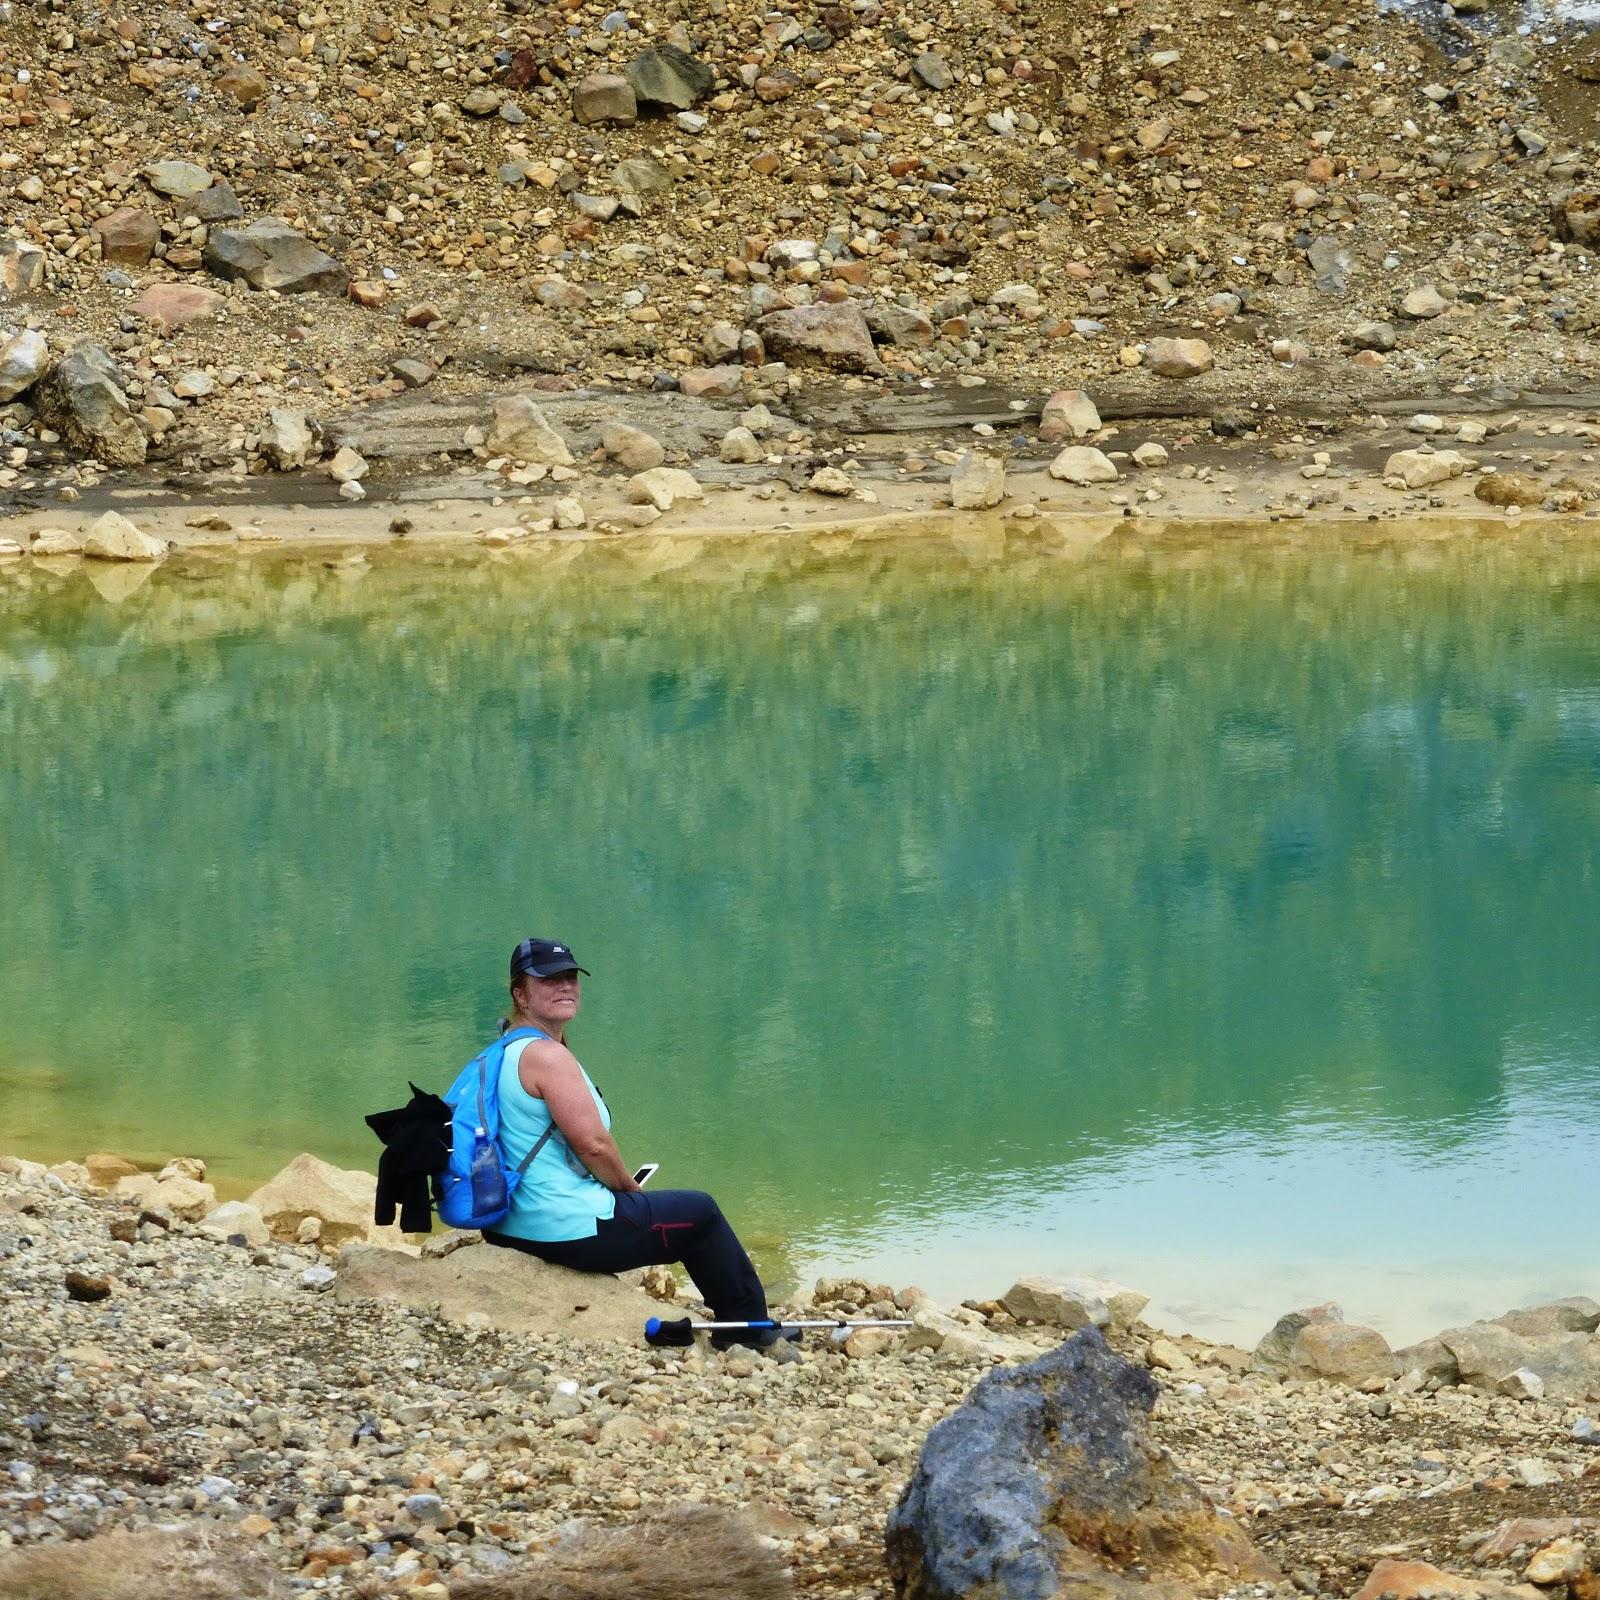 Viaje a Aotearoa: En la Tongariro Alpine Crossing